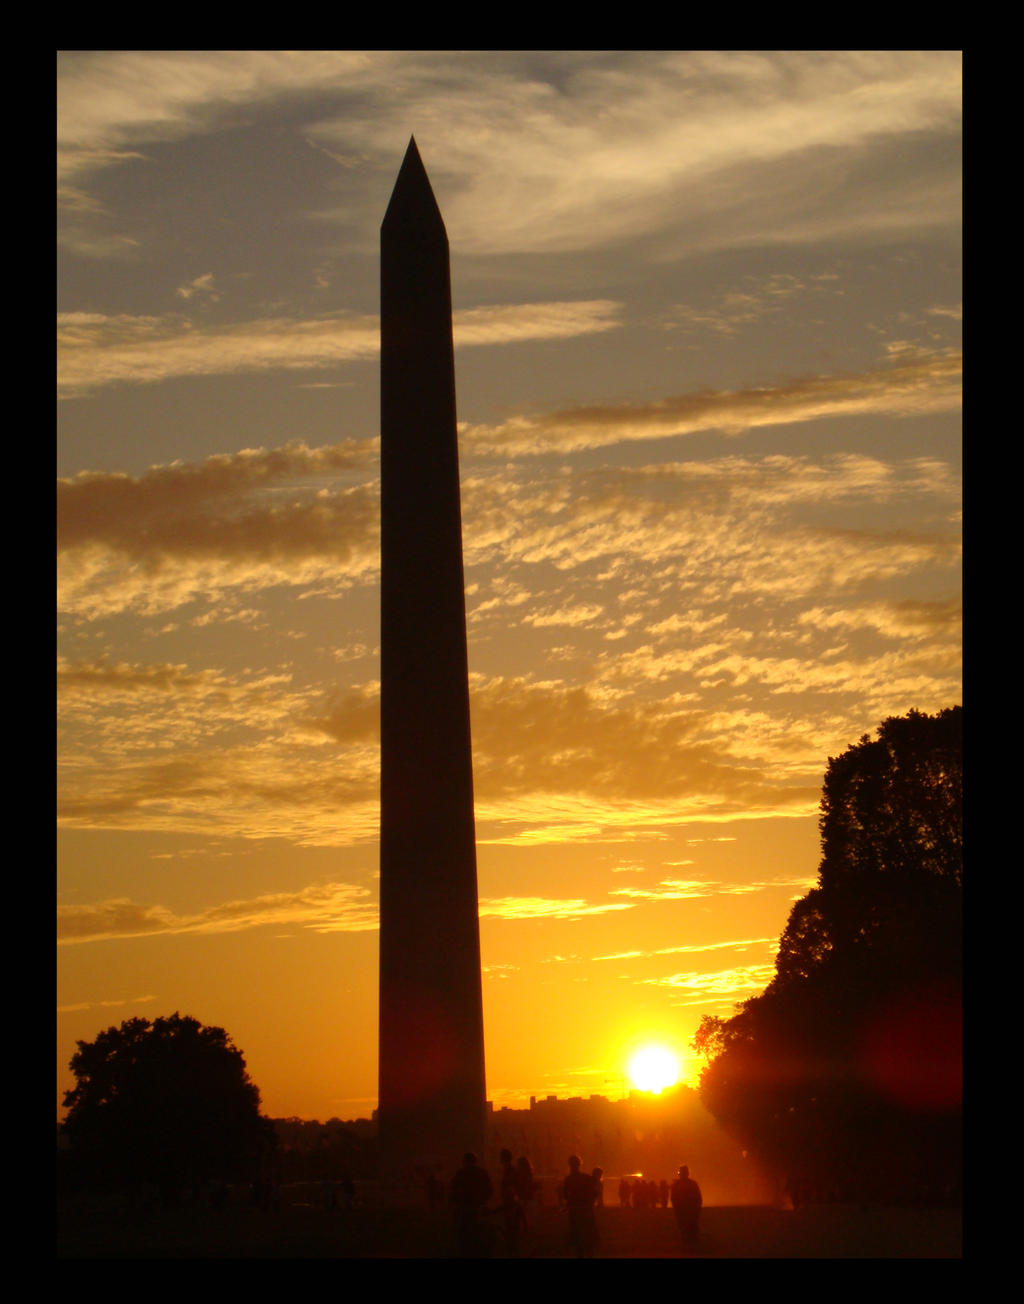 National Monument at Sunset by VivzMind